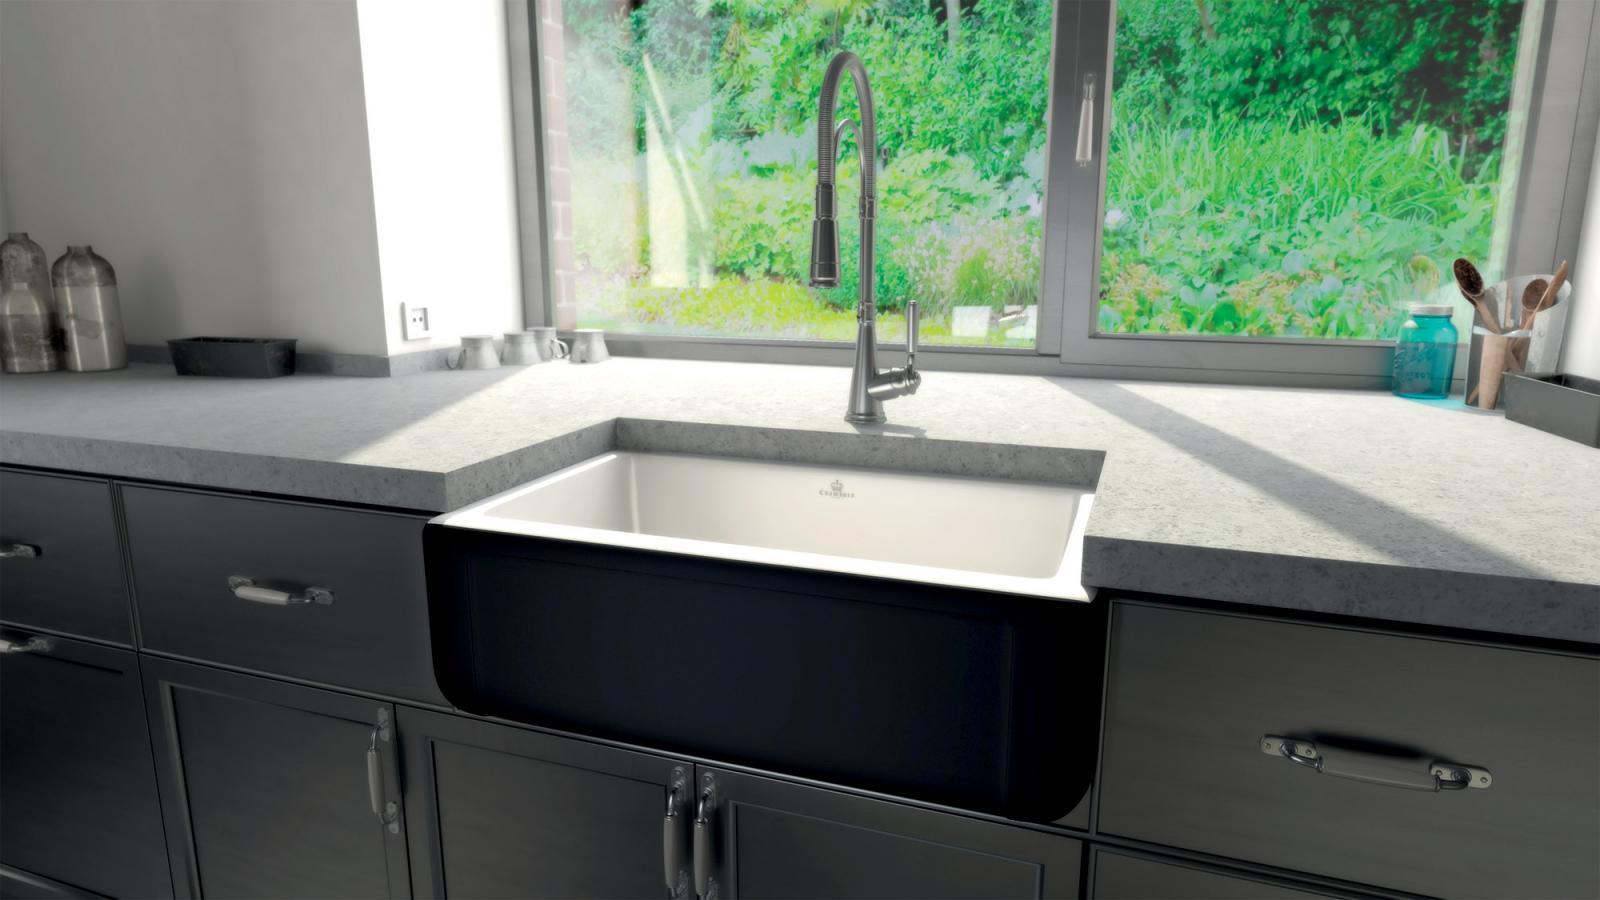 High-quality sink Henri II Le Grand Black - single bowl, ceramic